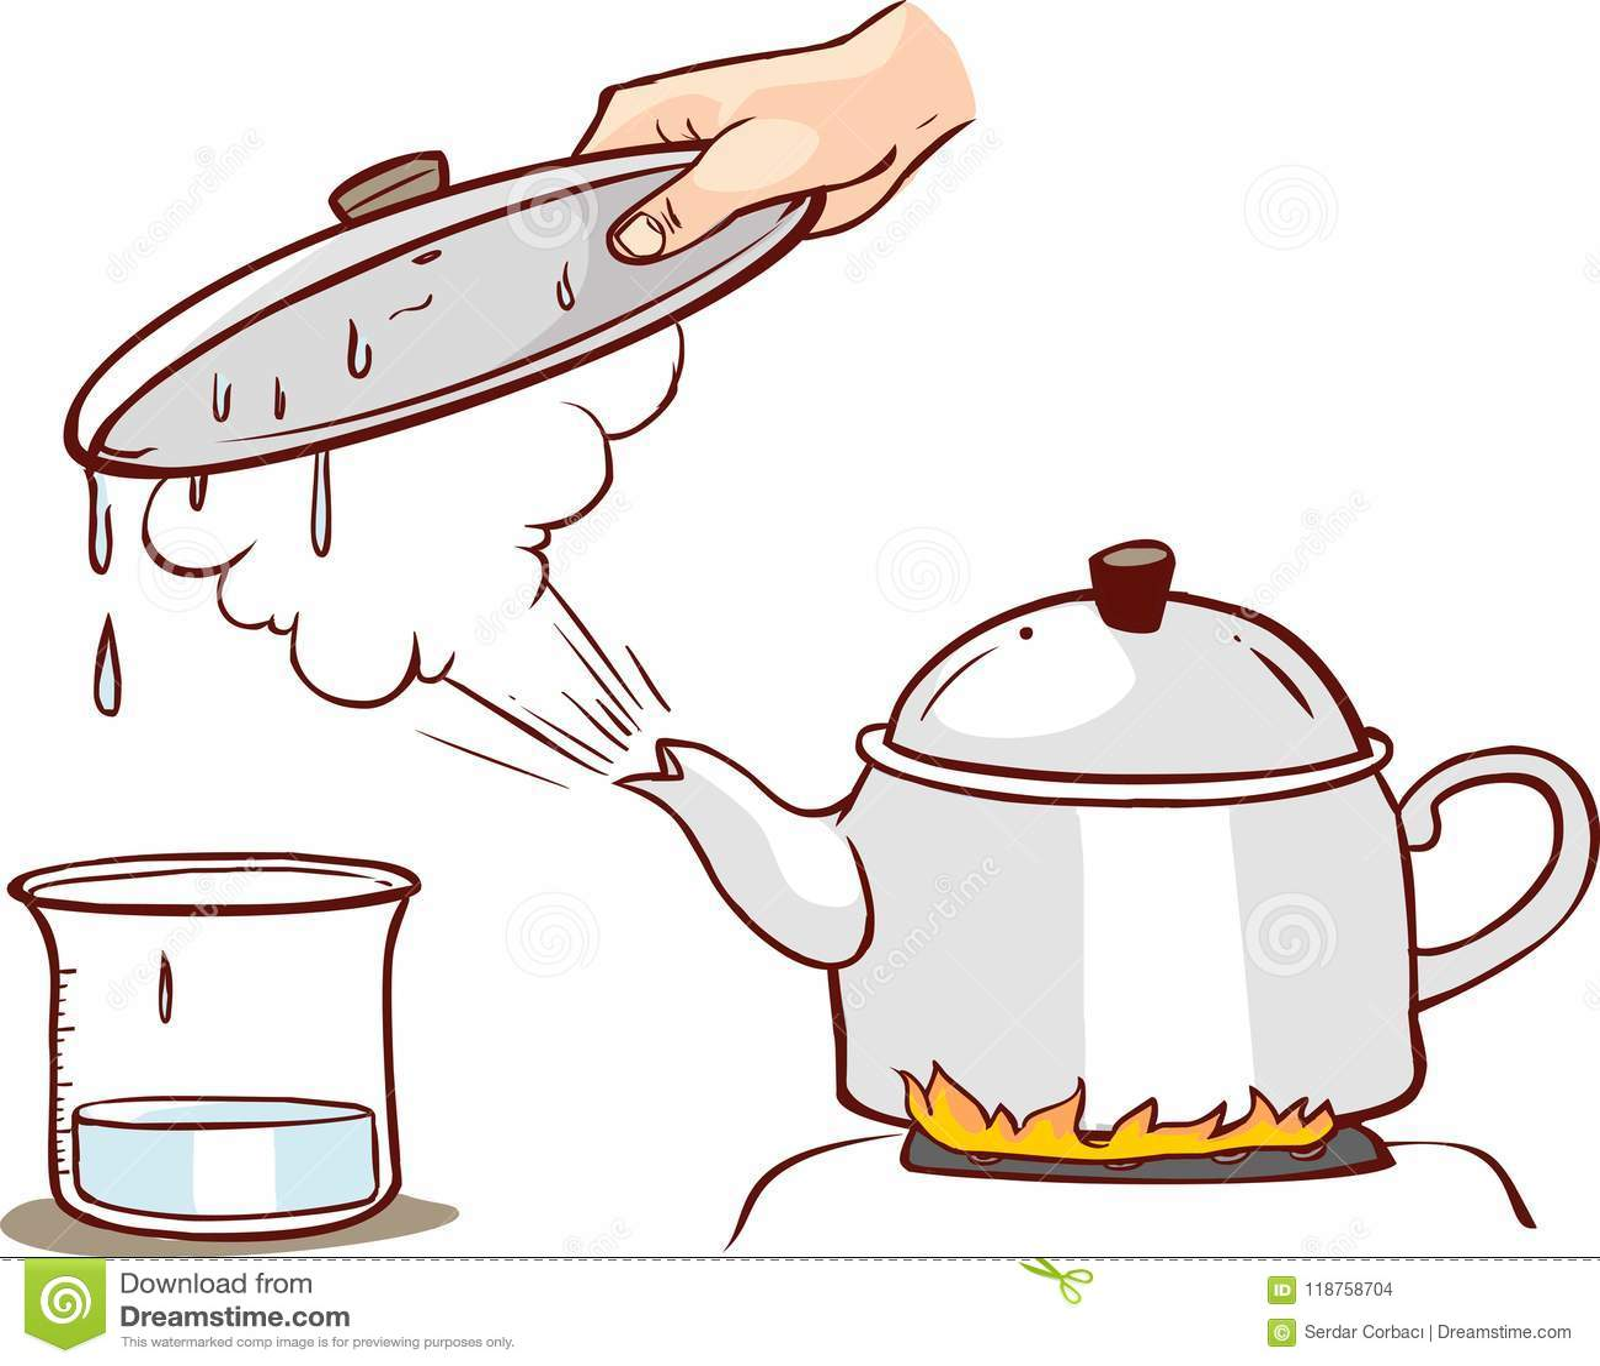 Teapot Clipart Evaporation Water Illustration Stock Vector